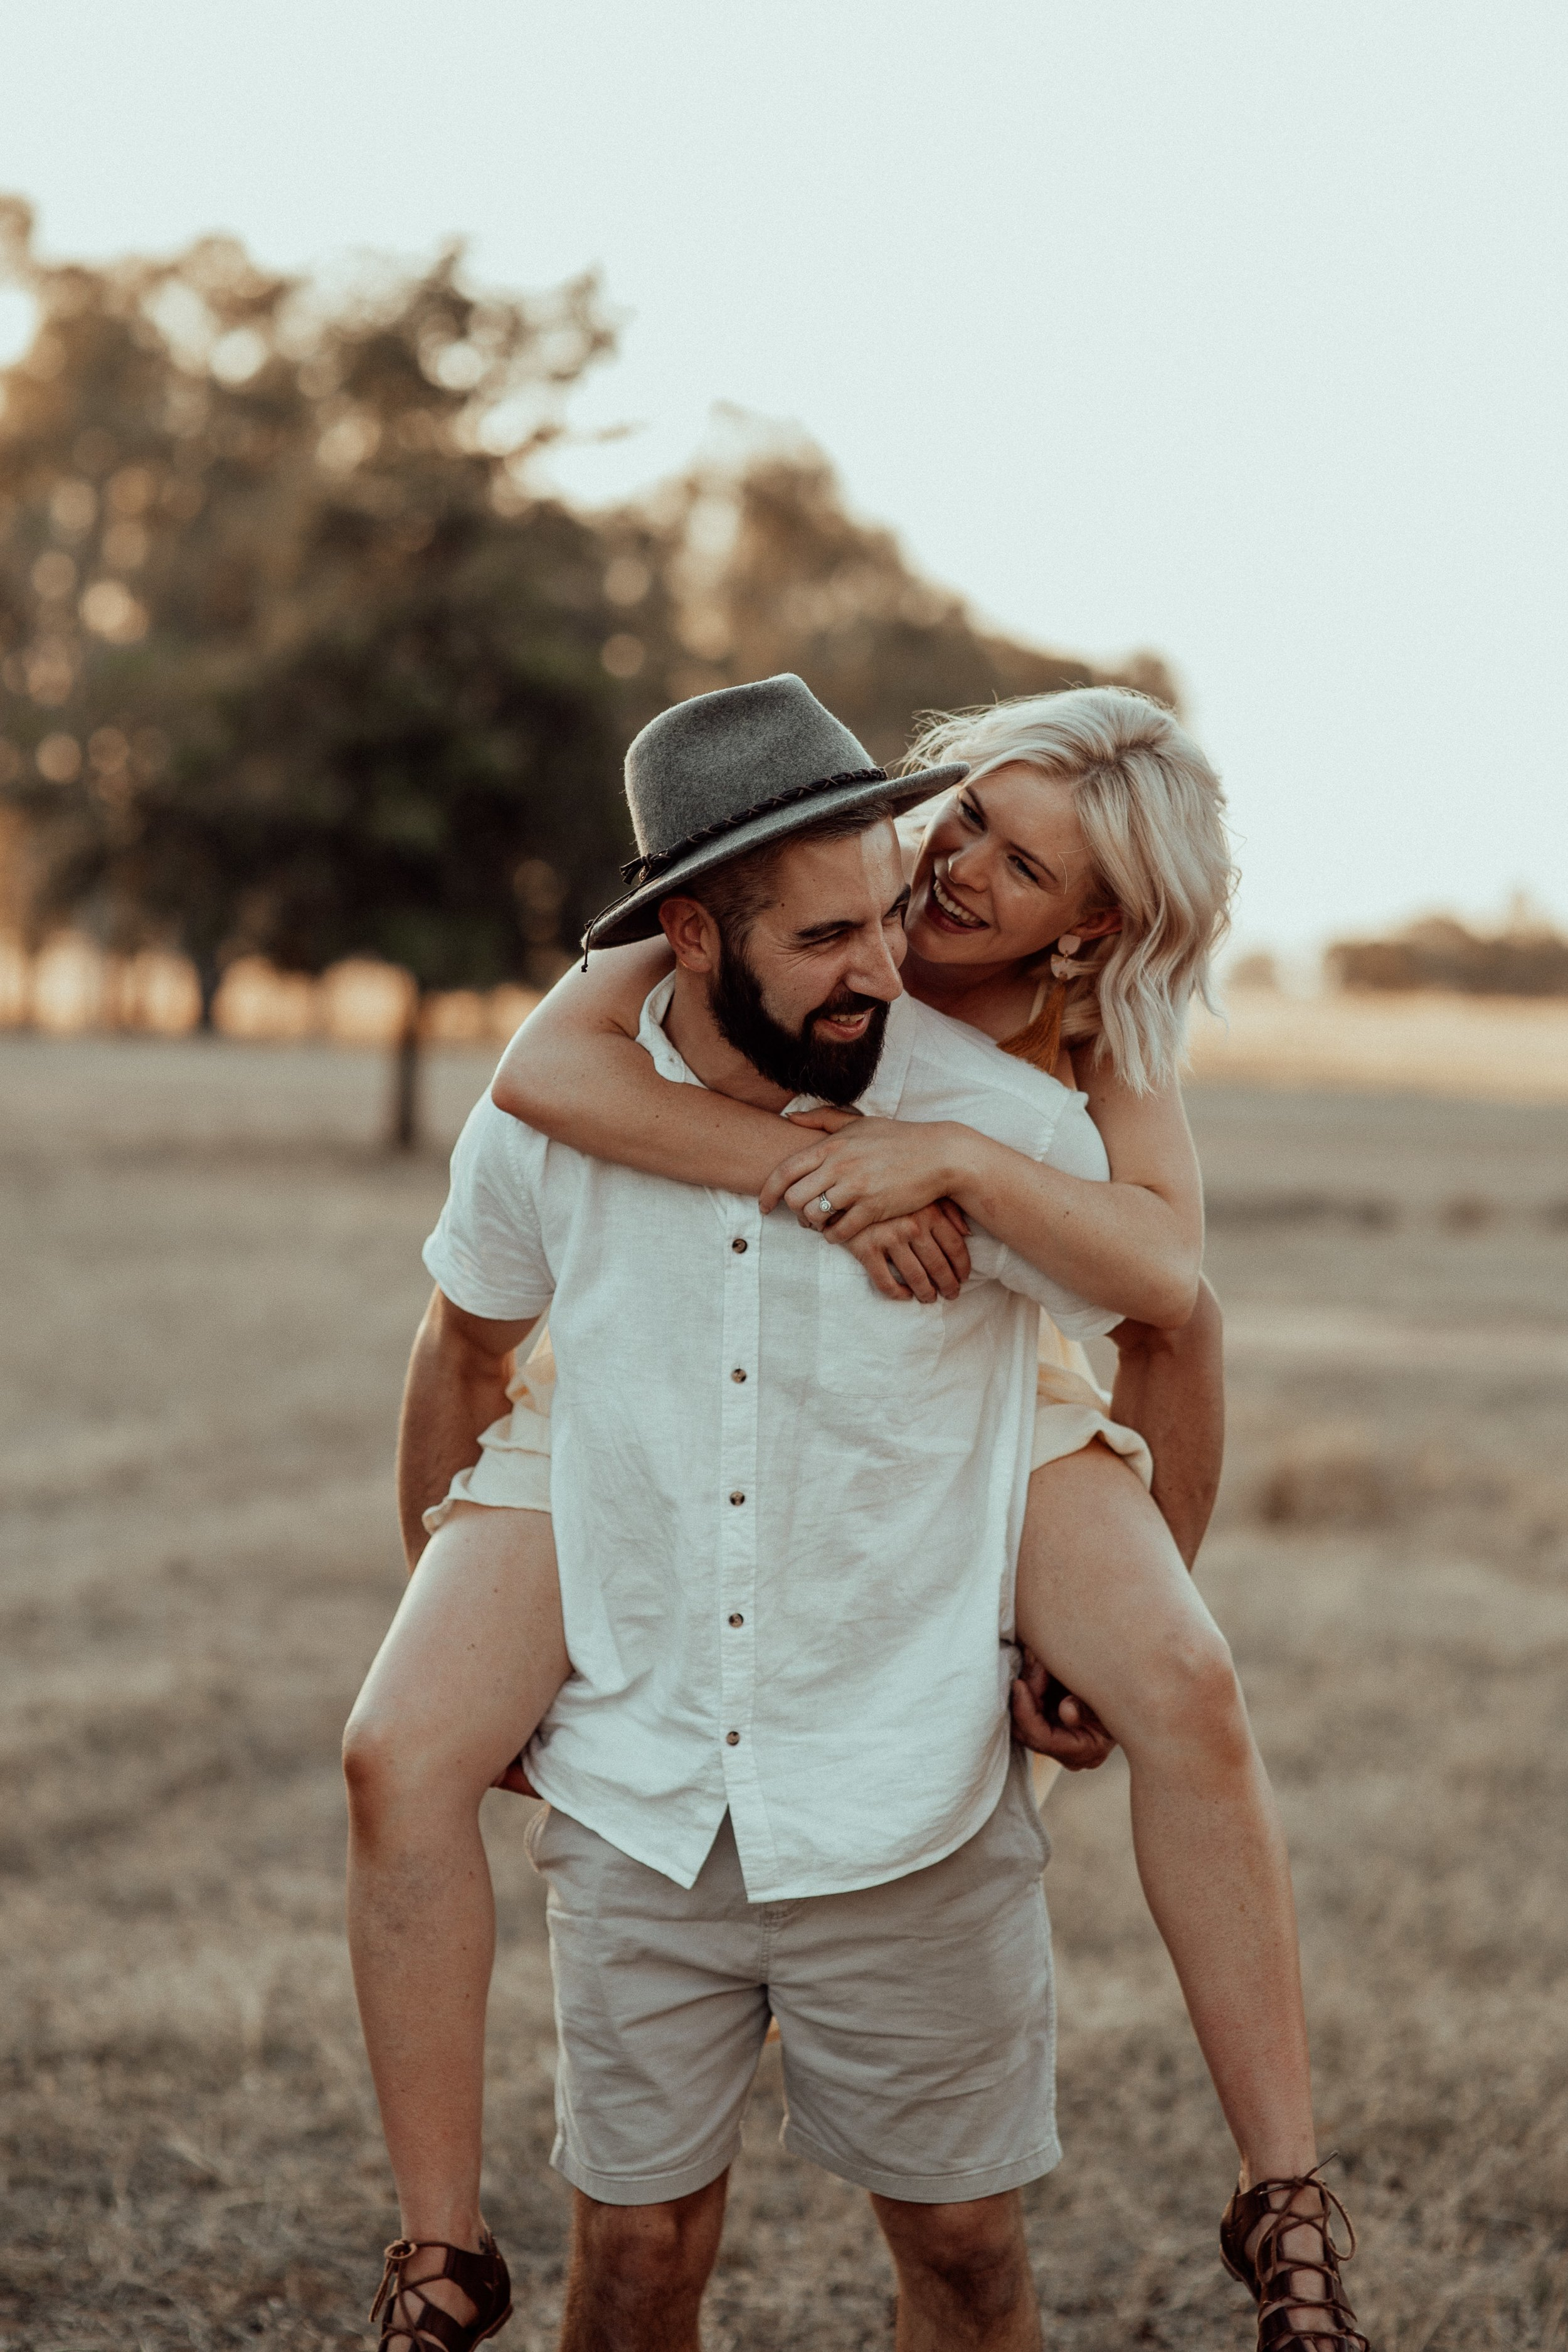 mickalathomas_puremacphotography_weddingphotographer_couplephotographer_Sheppartonphotographer_1636.jpg